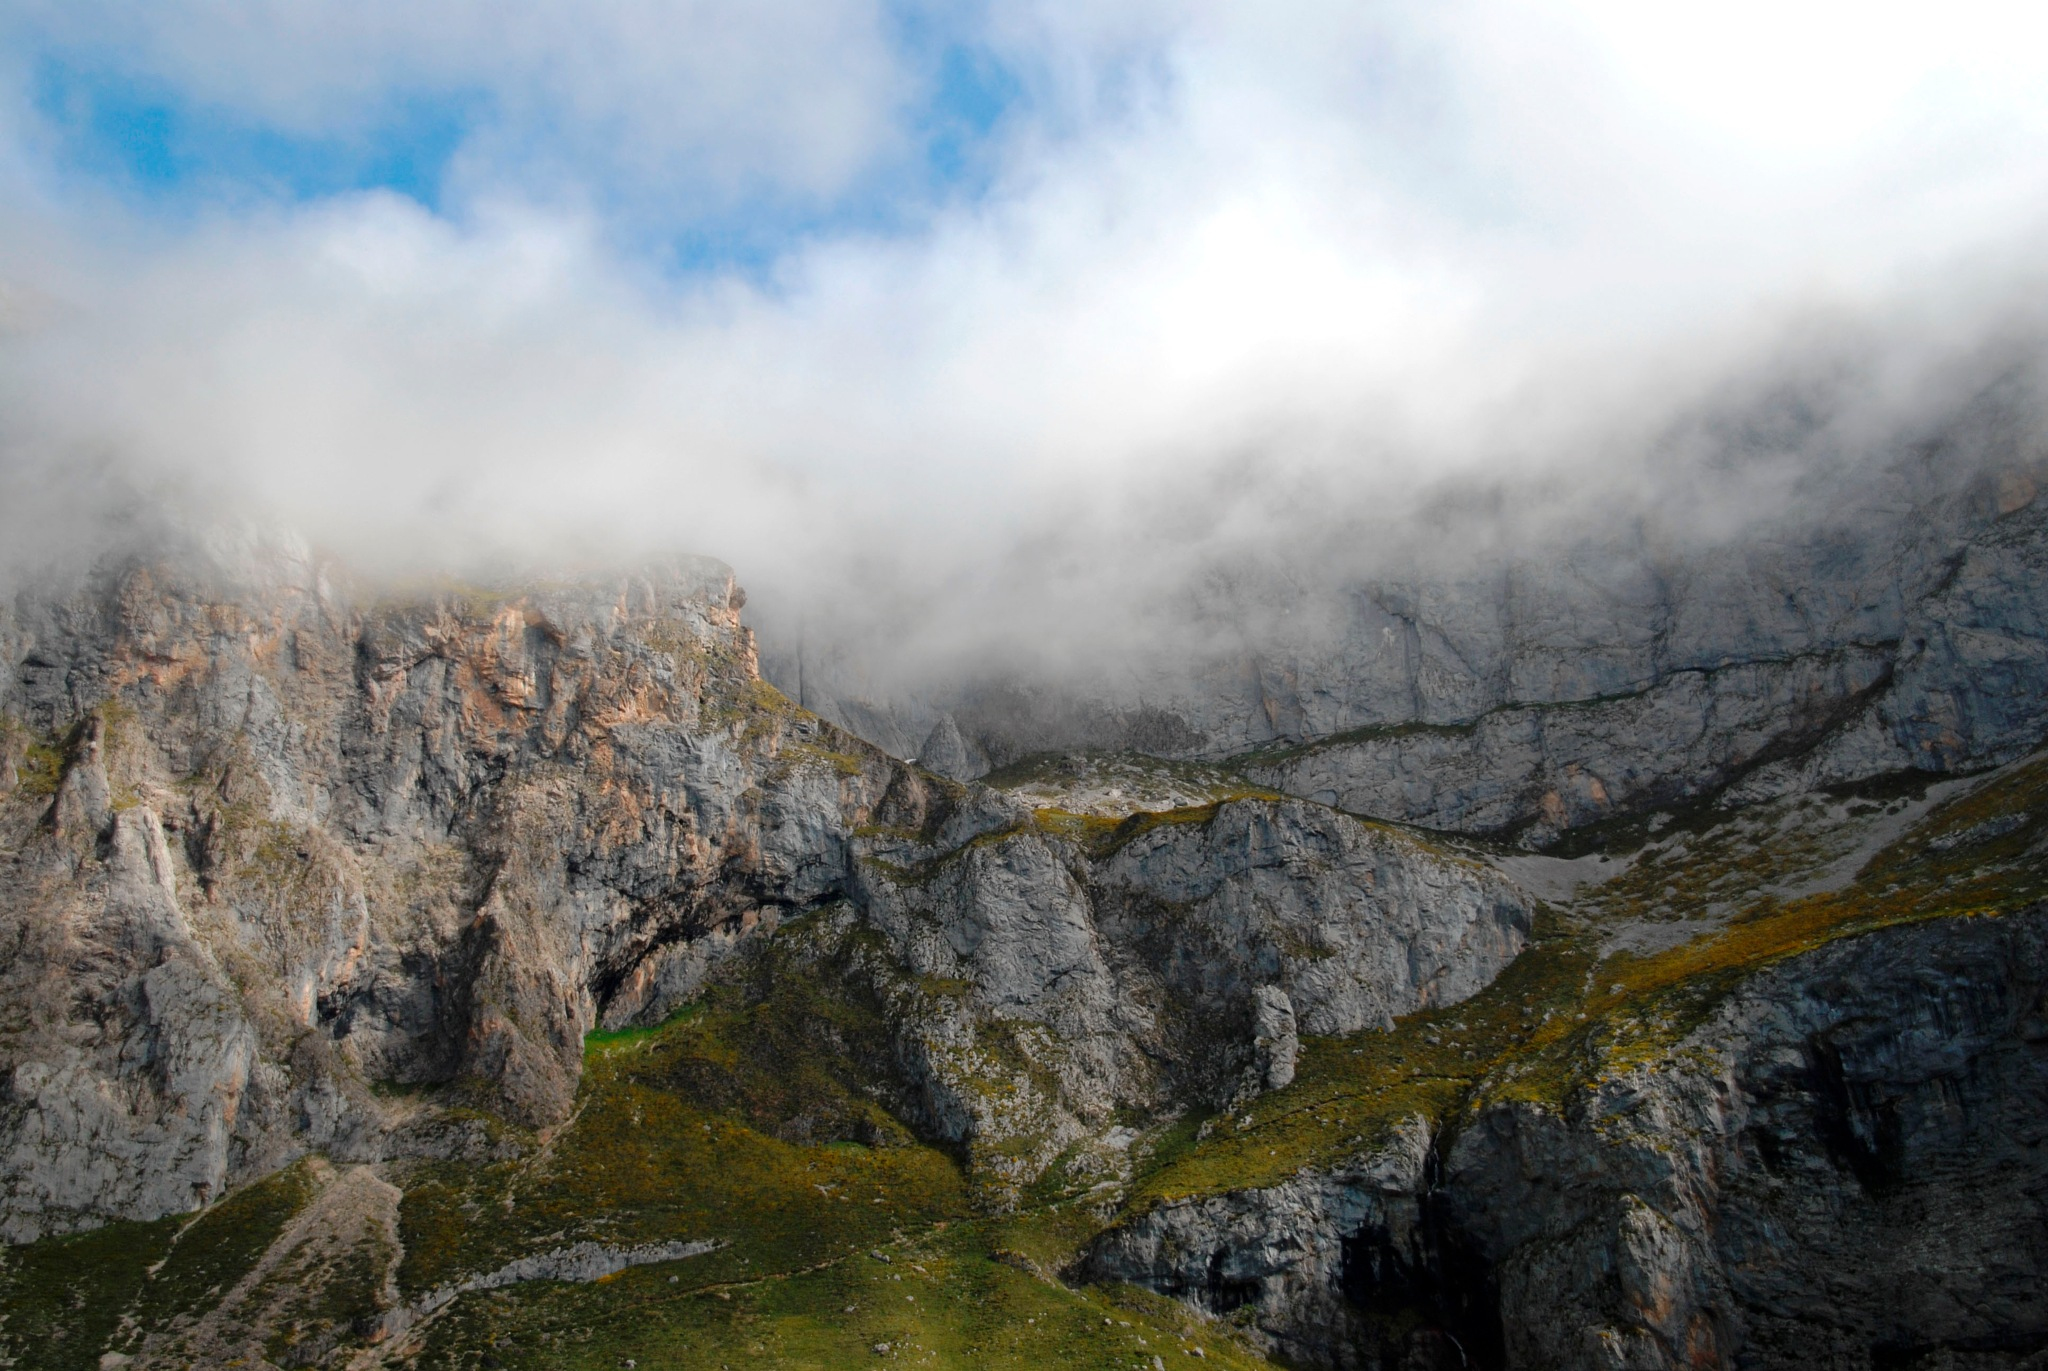 Picos de Europa by edmund hirschfeld